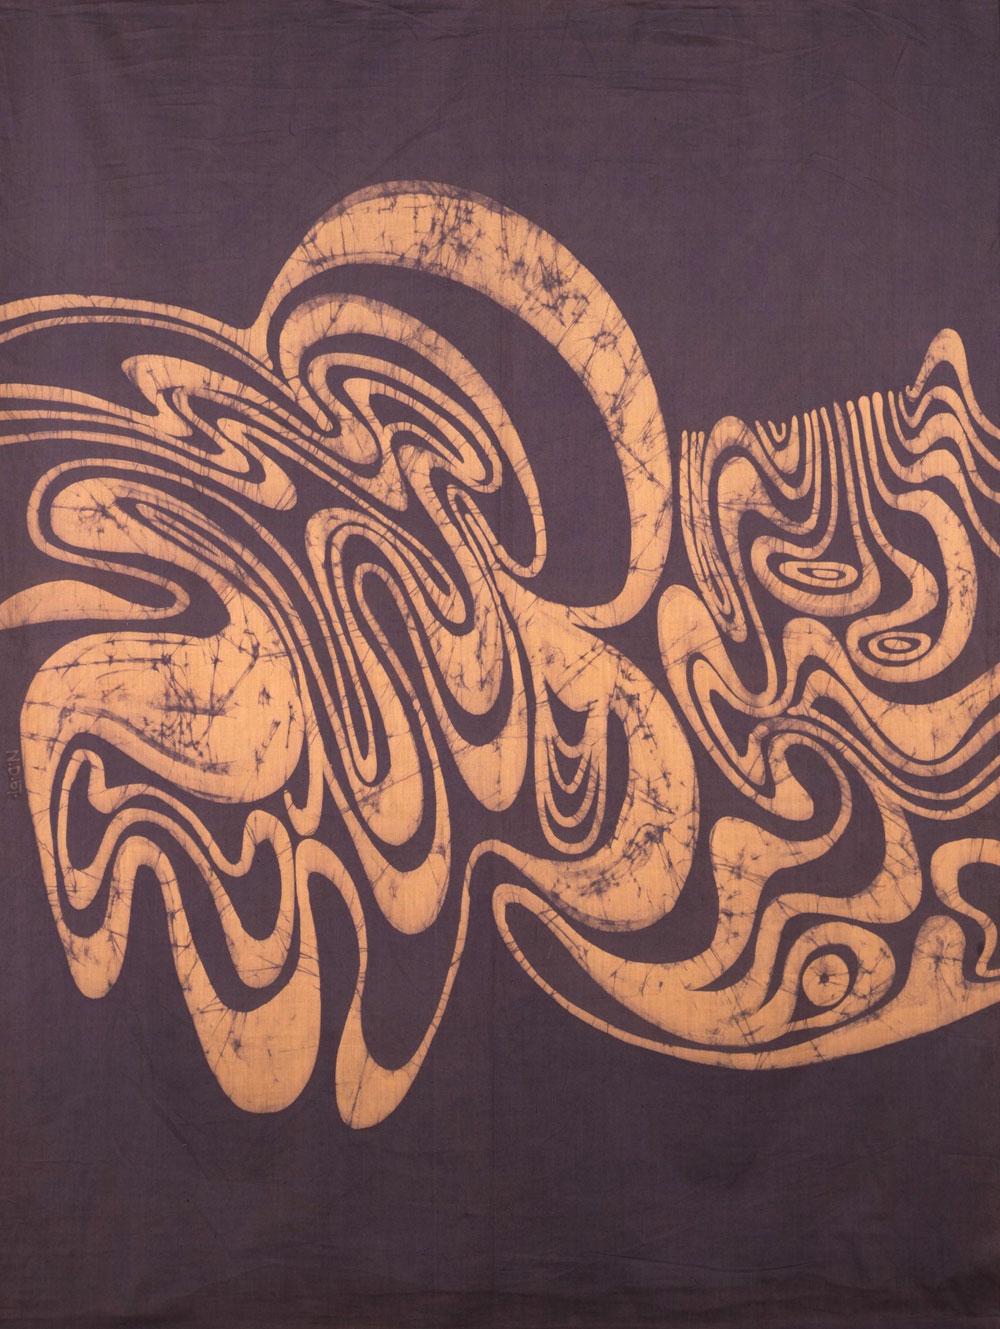 Wallhanging, Noel Dyrenforth, 1967. Museum no. CIRC.58-1967